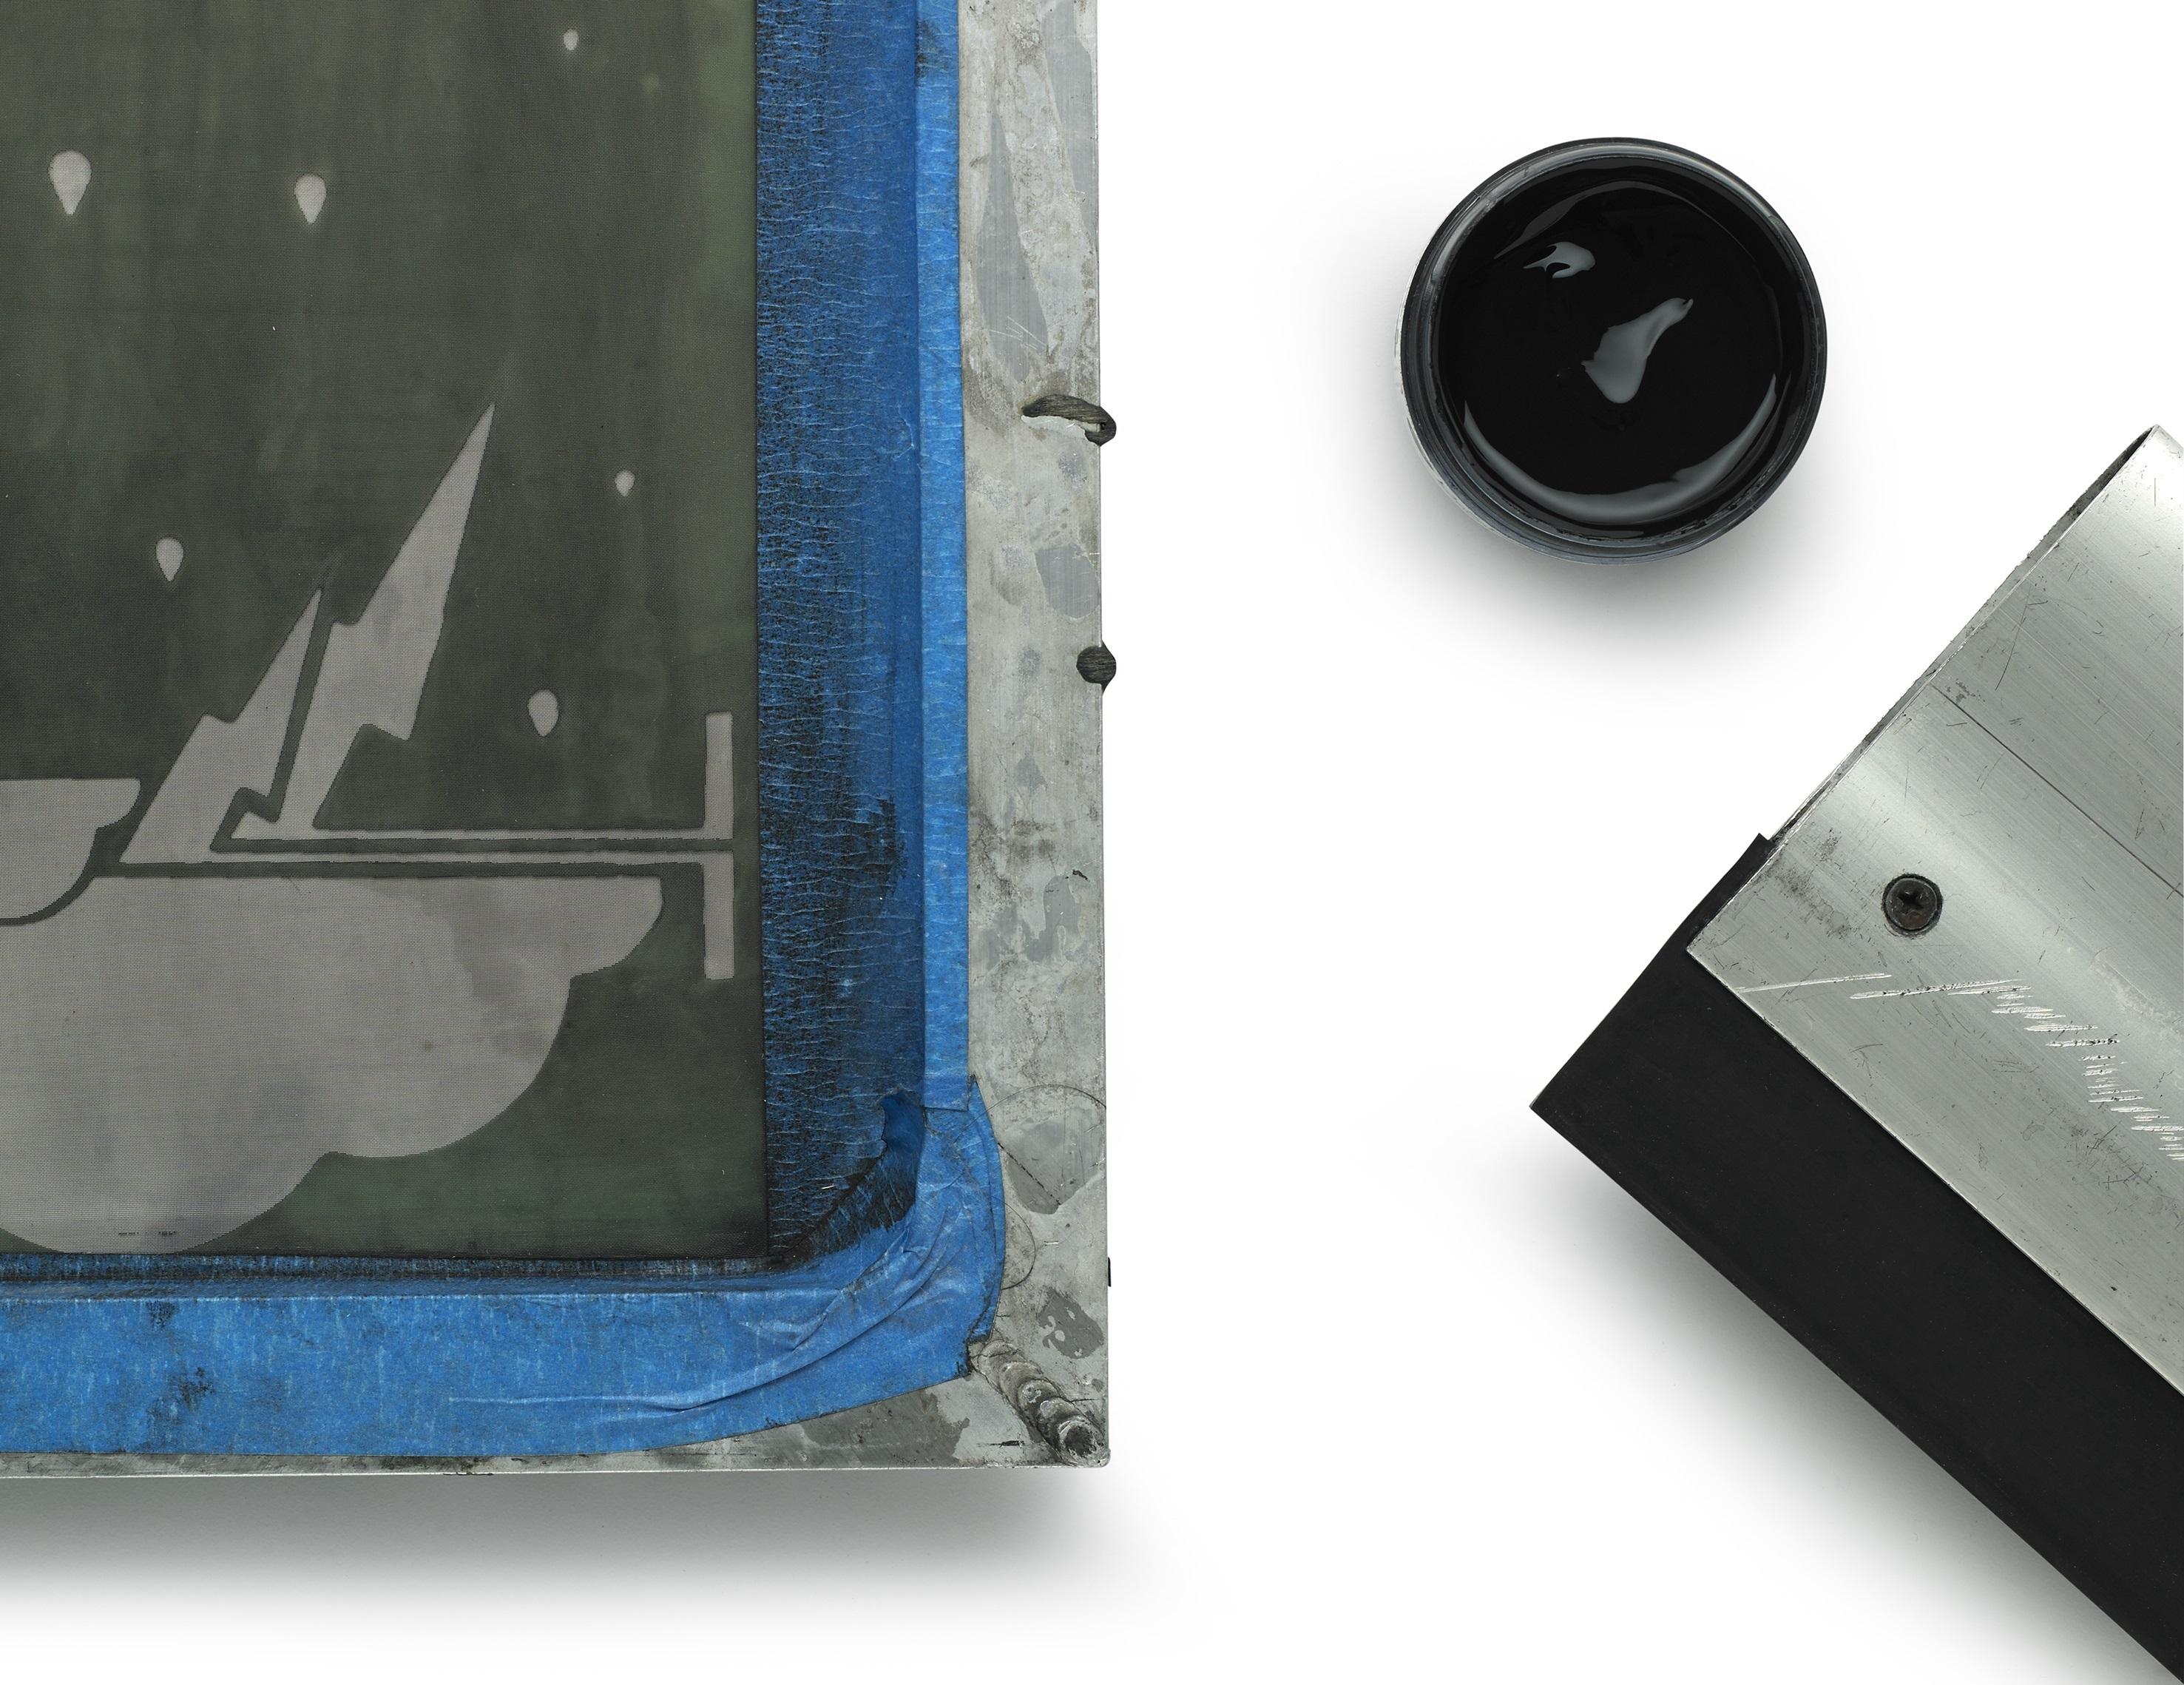 50ml jar bare conductive electric paint electrical glue solder pcb repair ebay. Black Bedroom Furniture Sets. Home Design Ideas